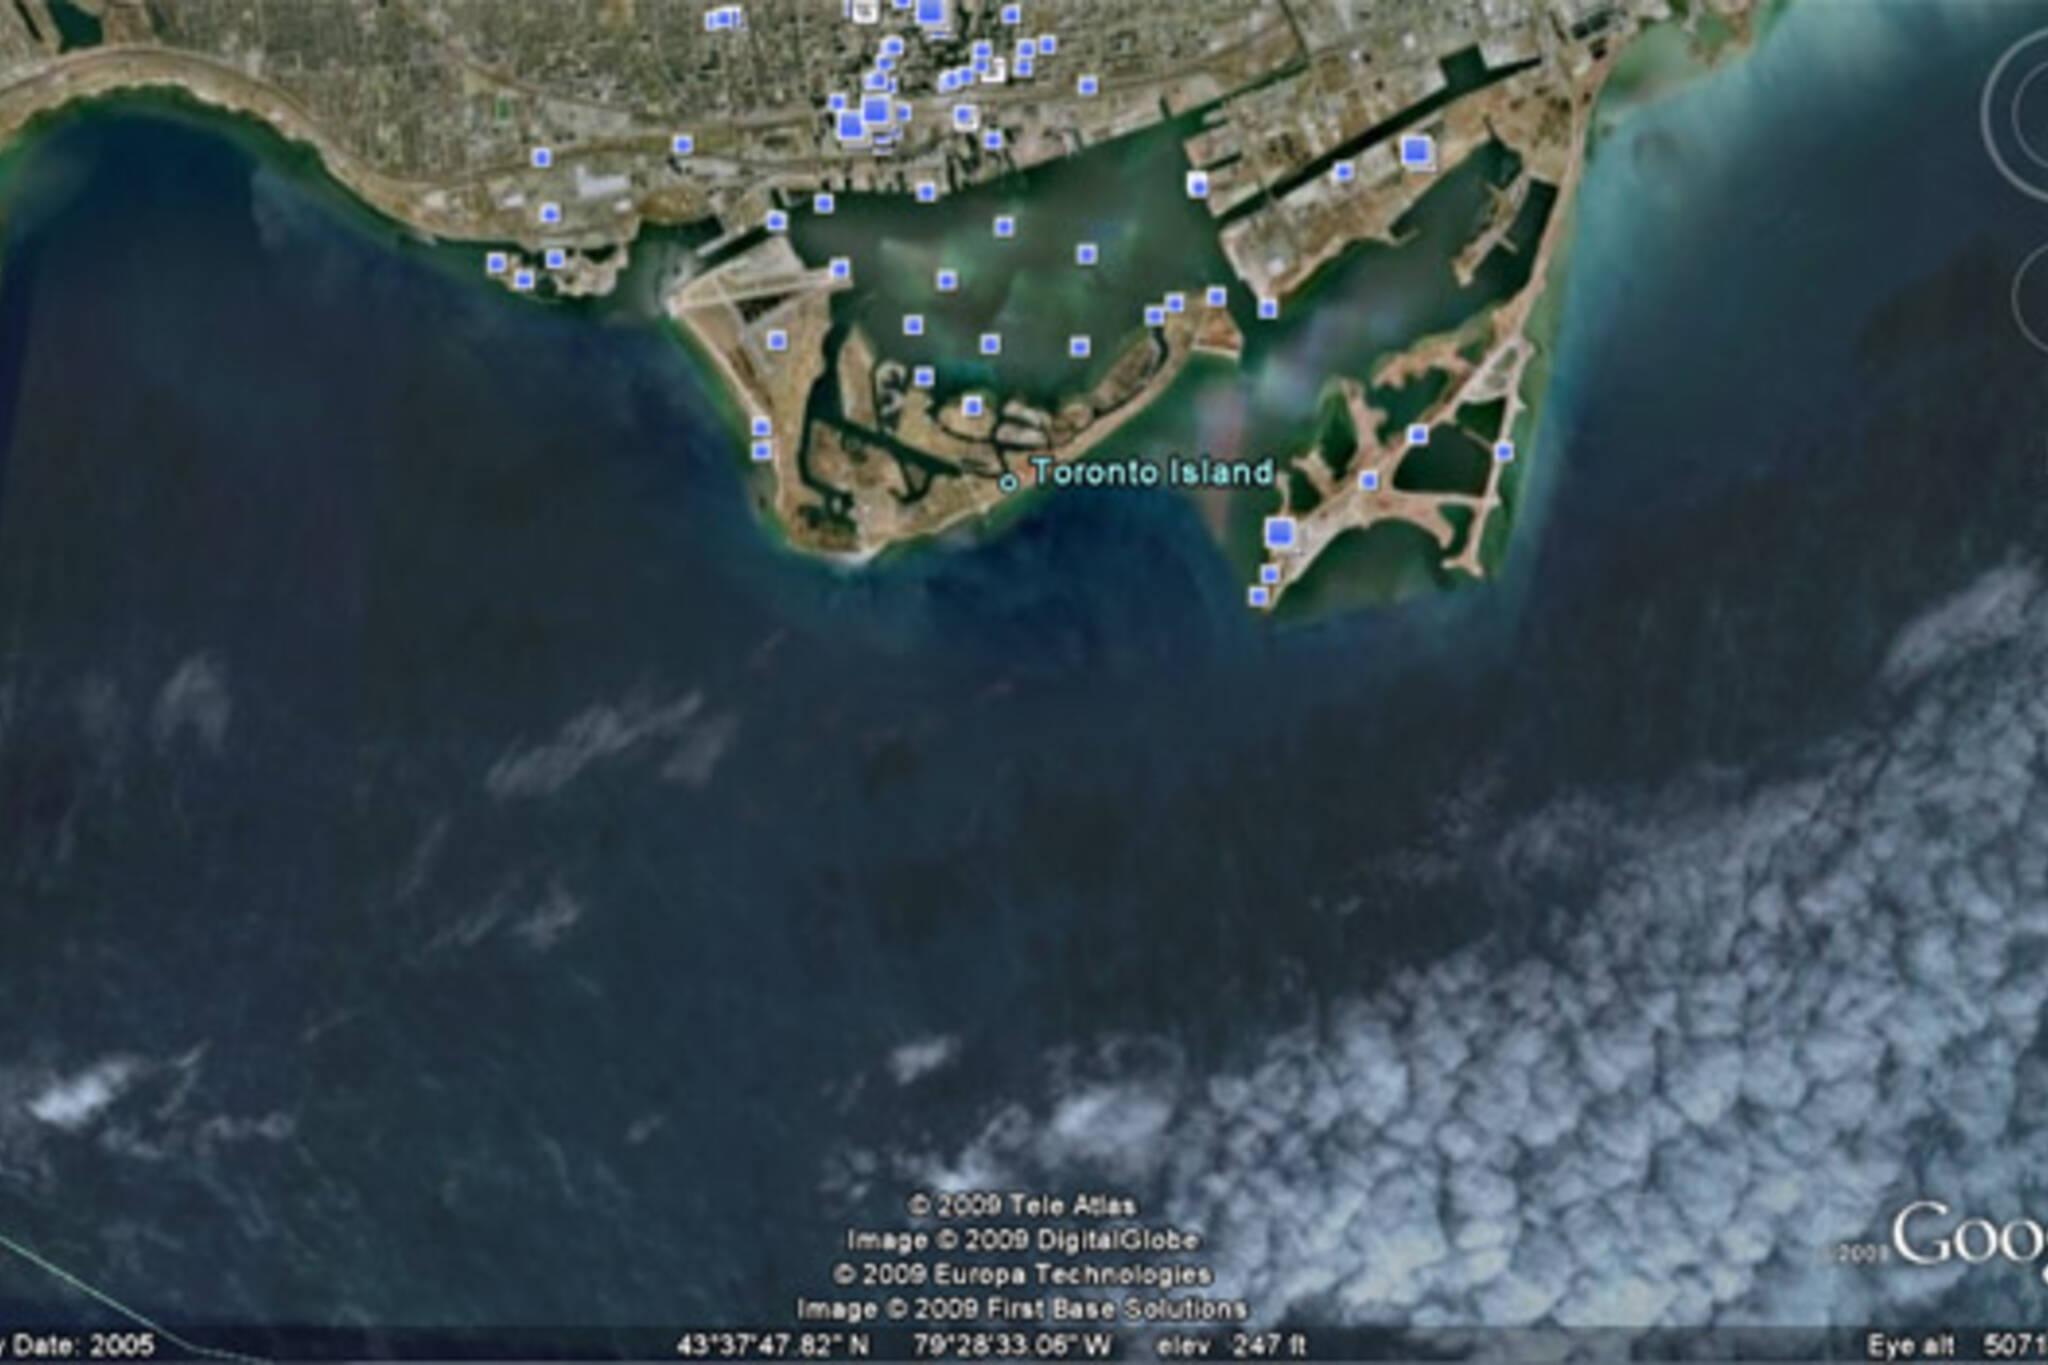 Toronto, as seen on Google Earth.